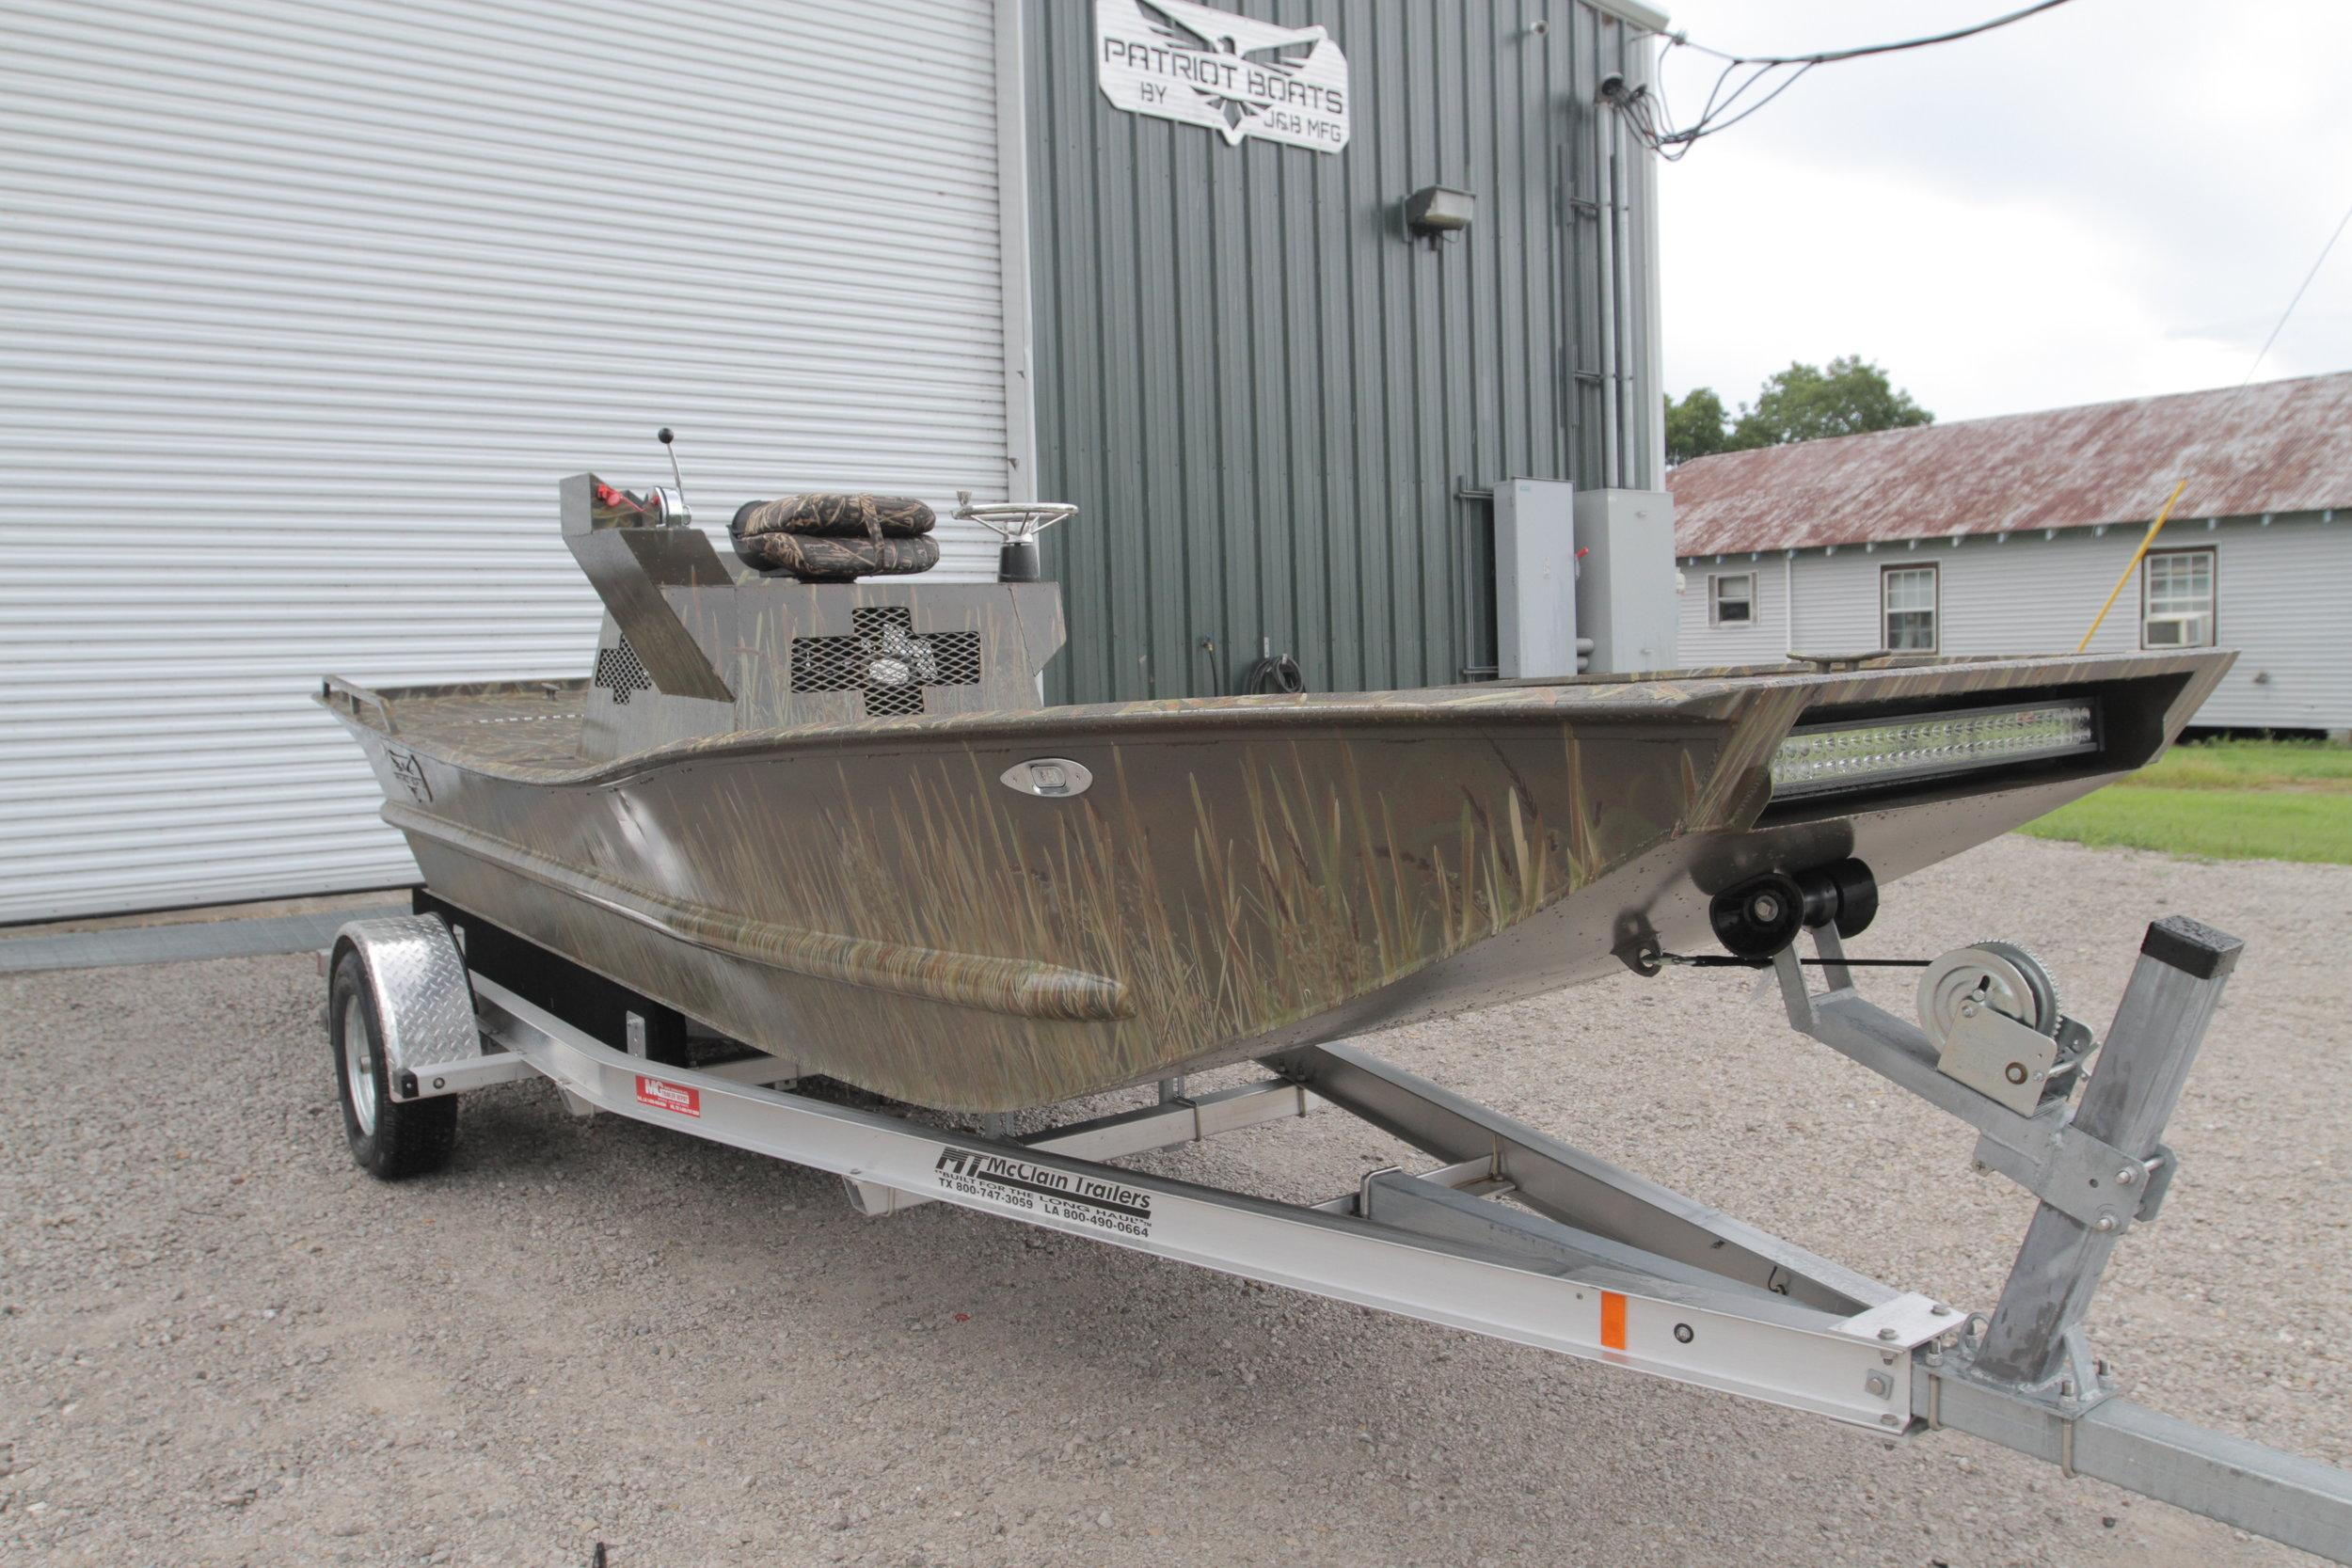 - 20ft duck boat